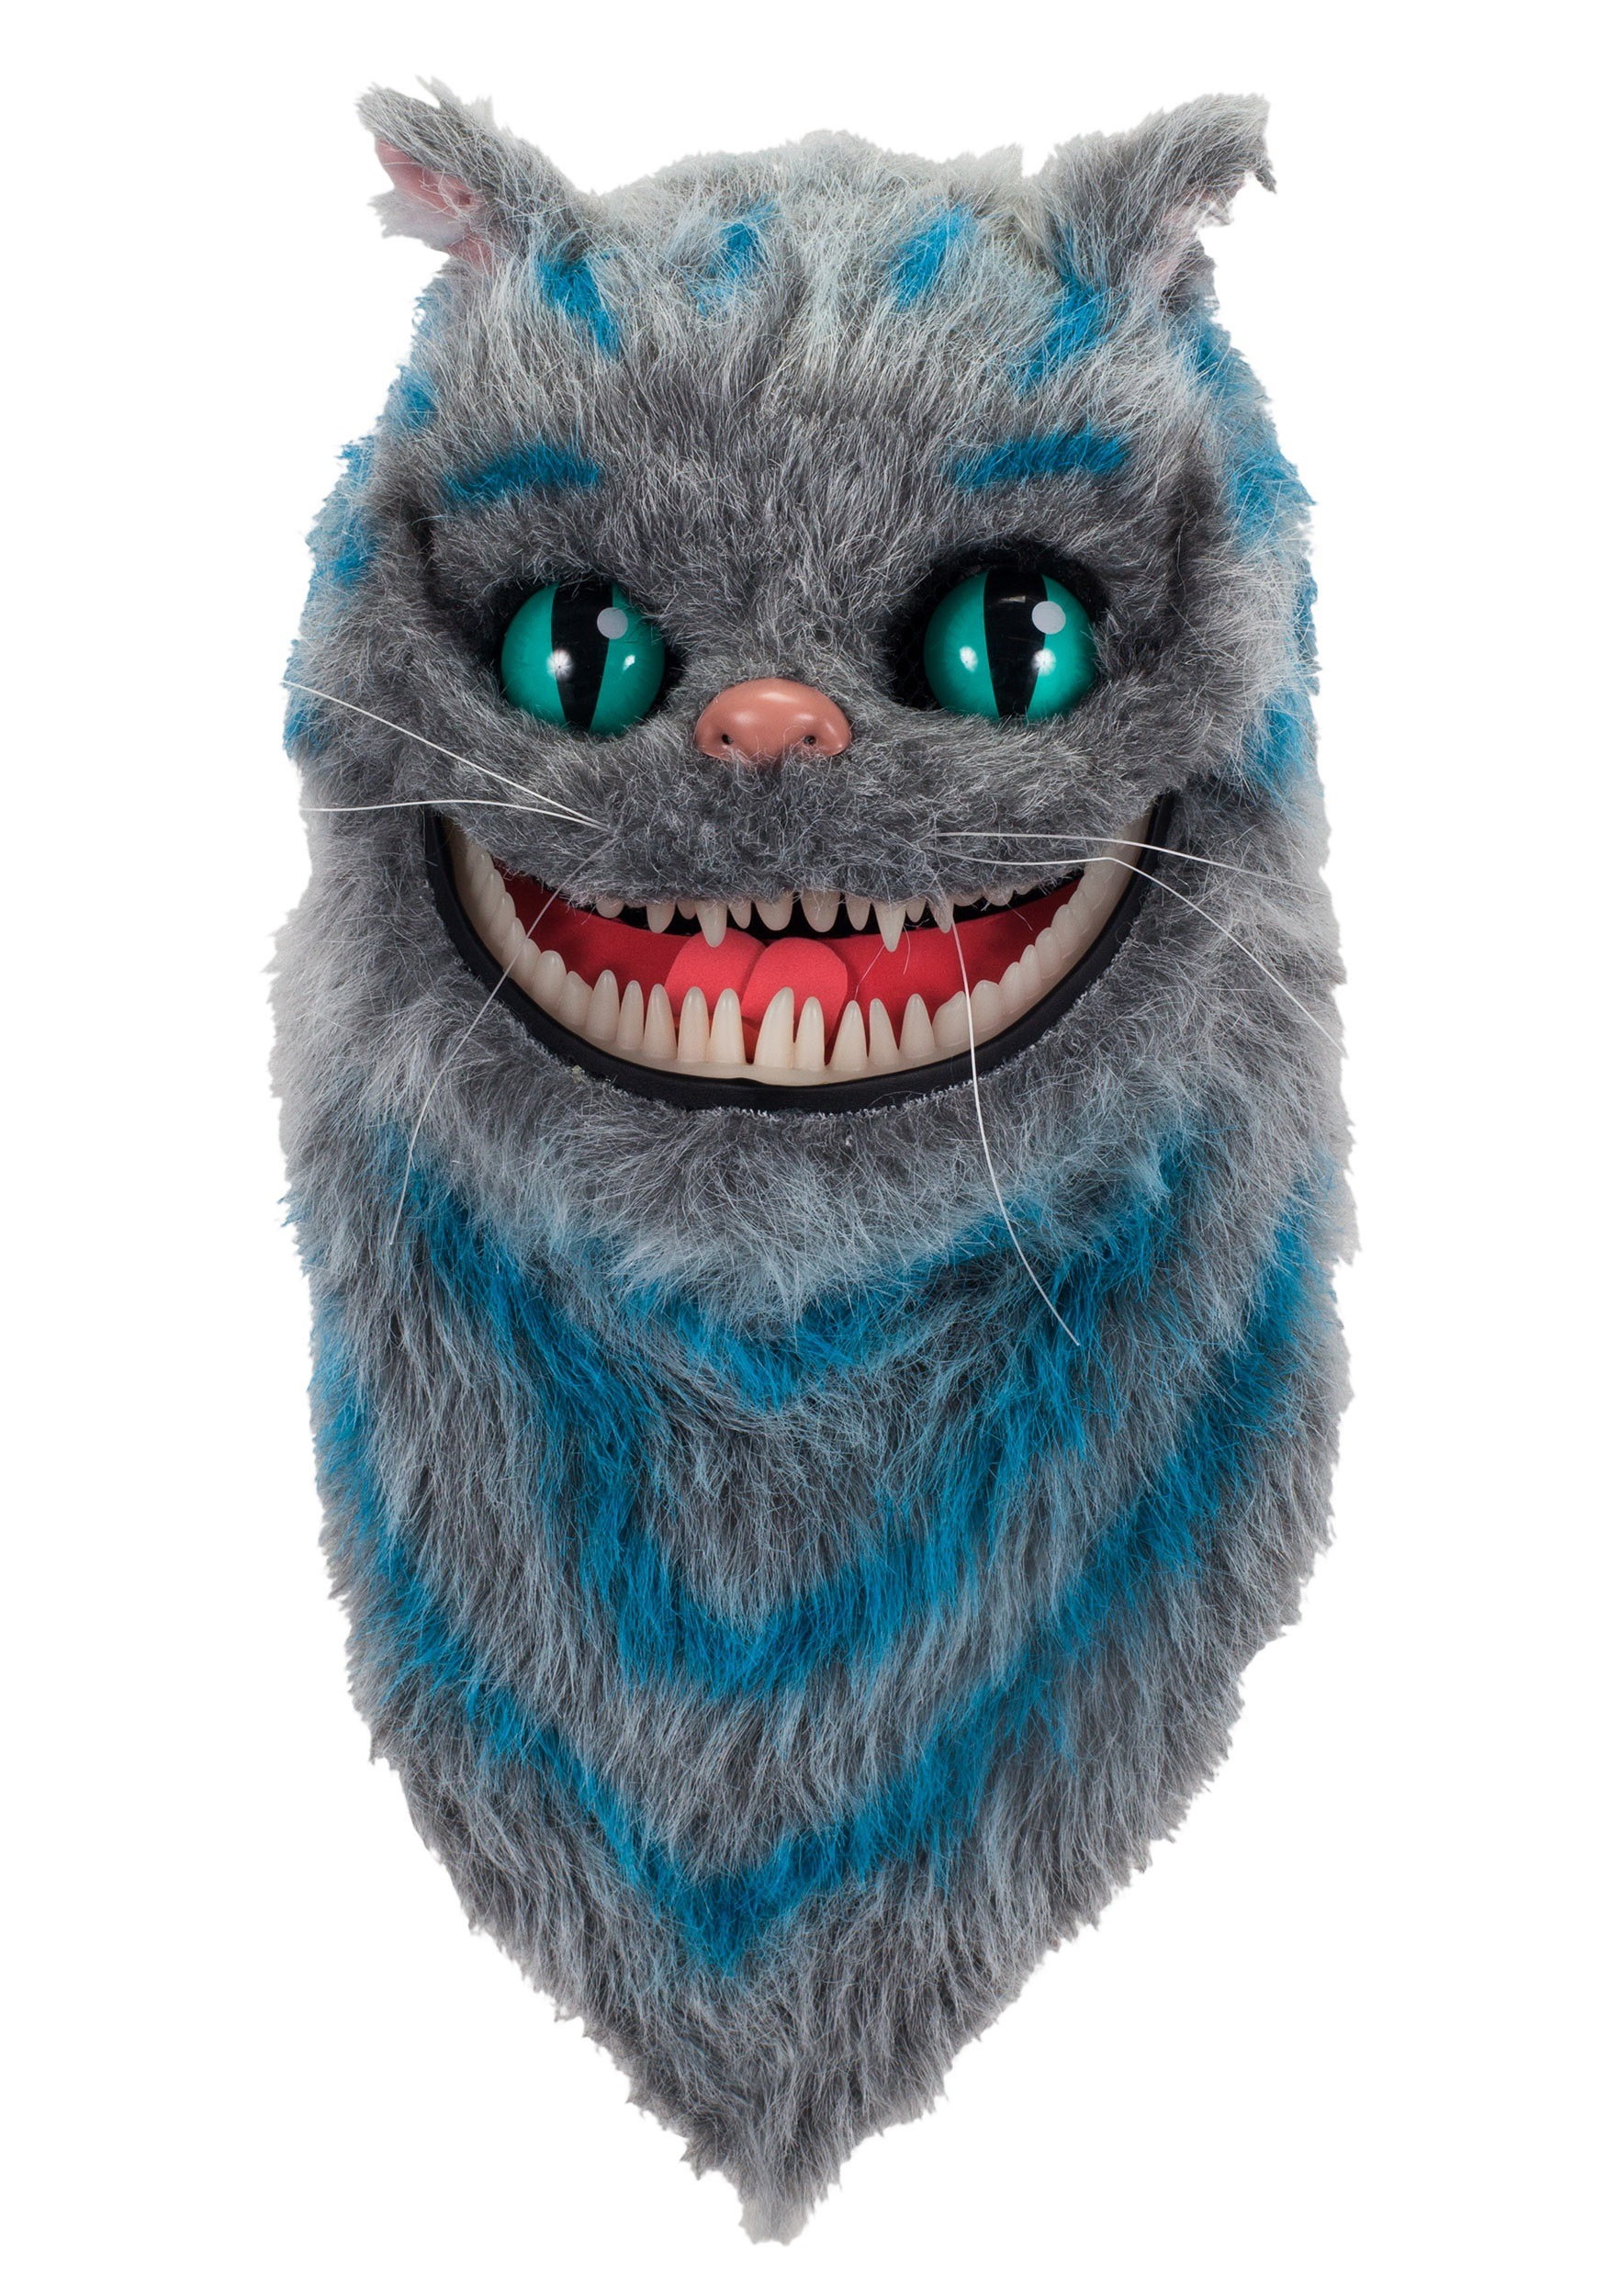 Alice In Wonderland Cheshire Cat Tattoo: Alice In Wonderland Cheshire Cat Mouth Mover Mask